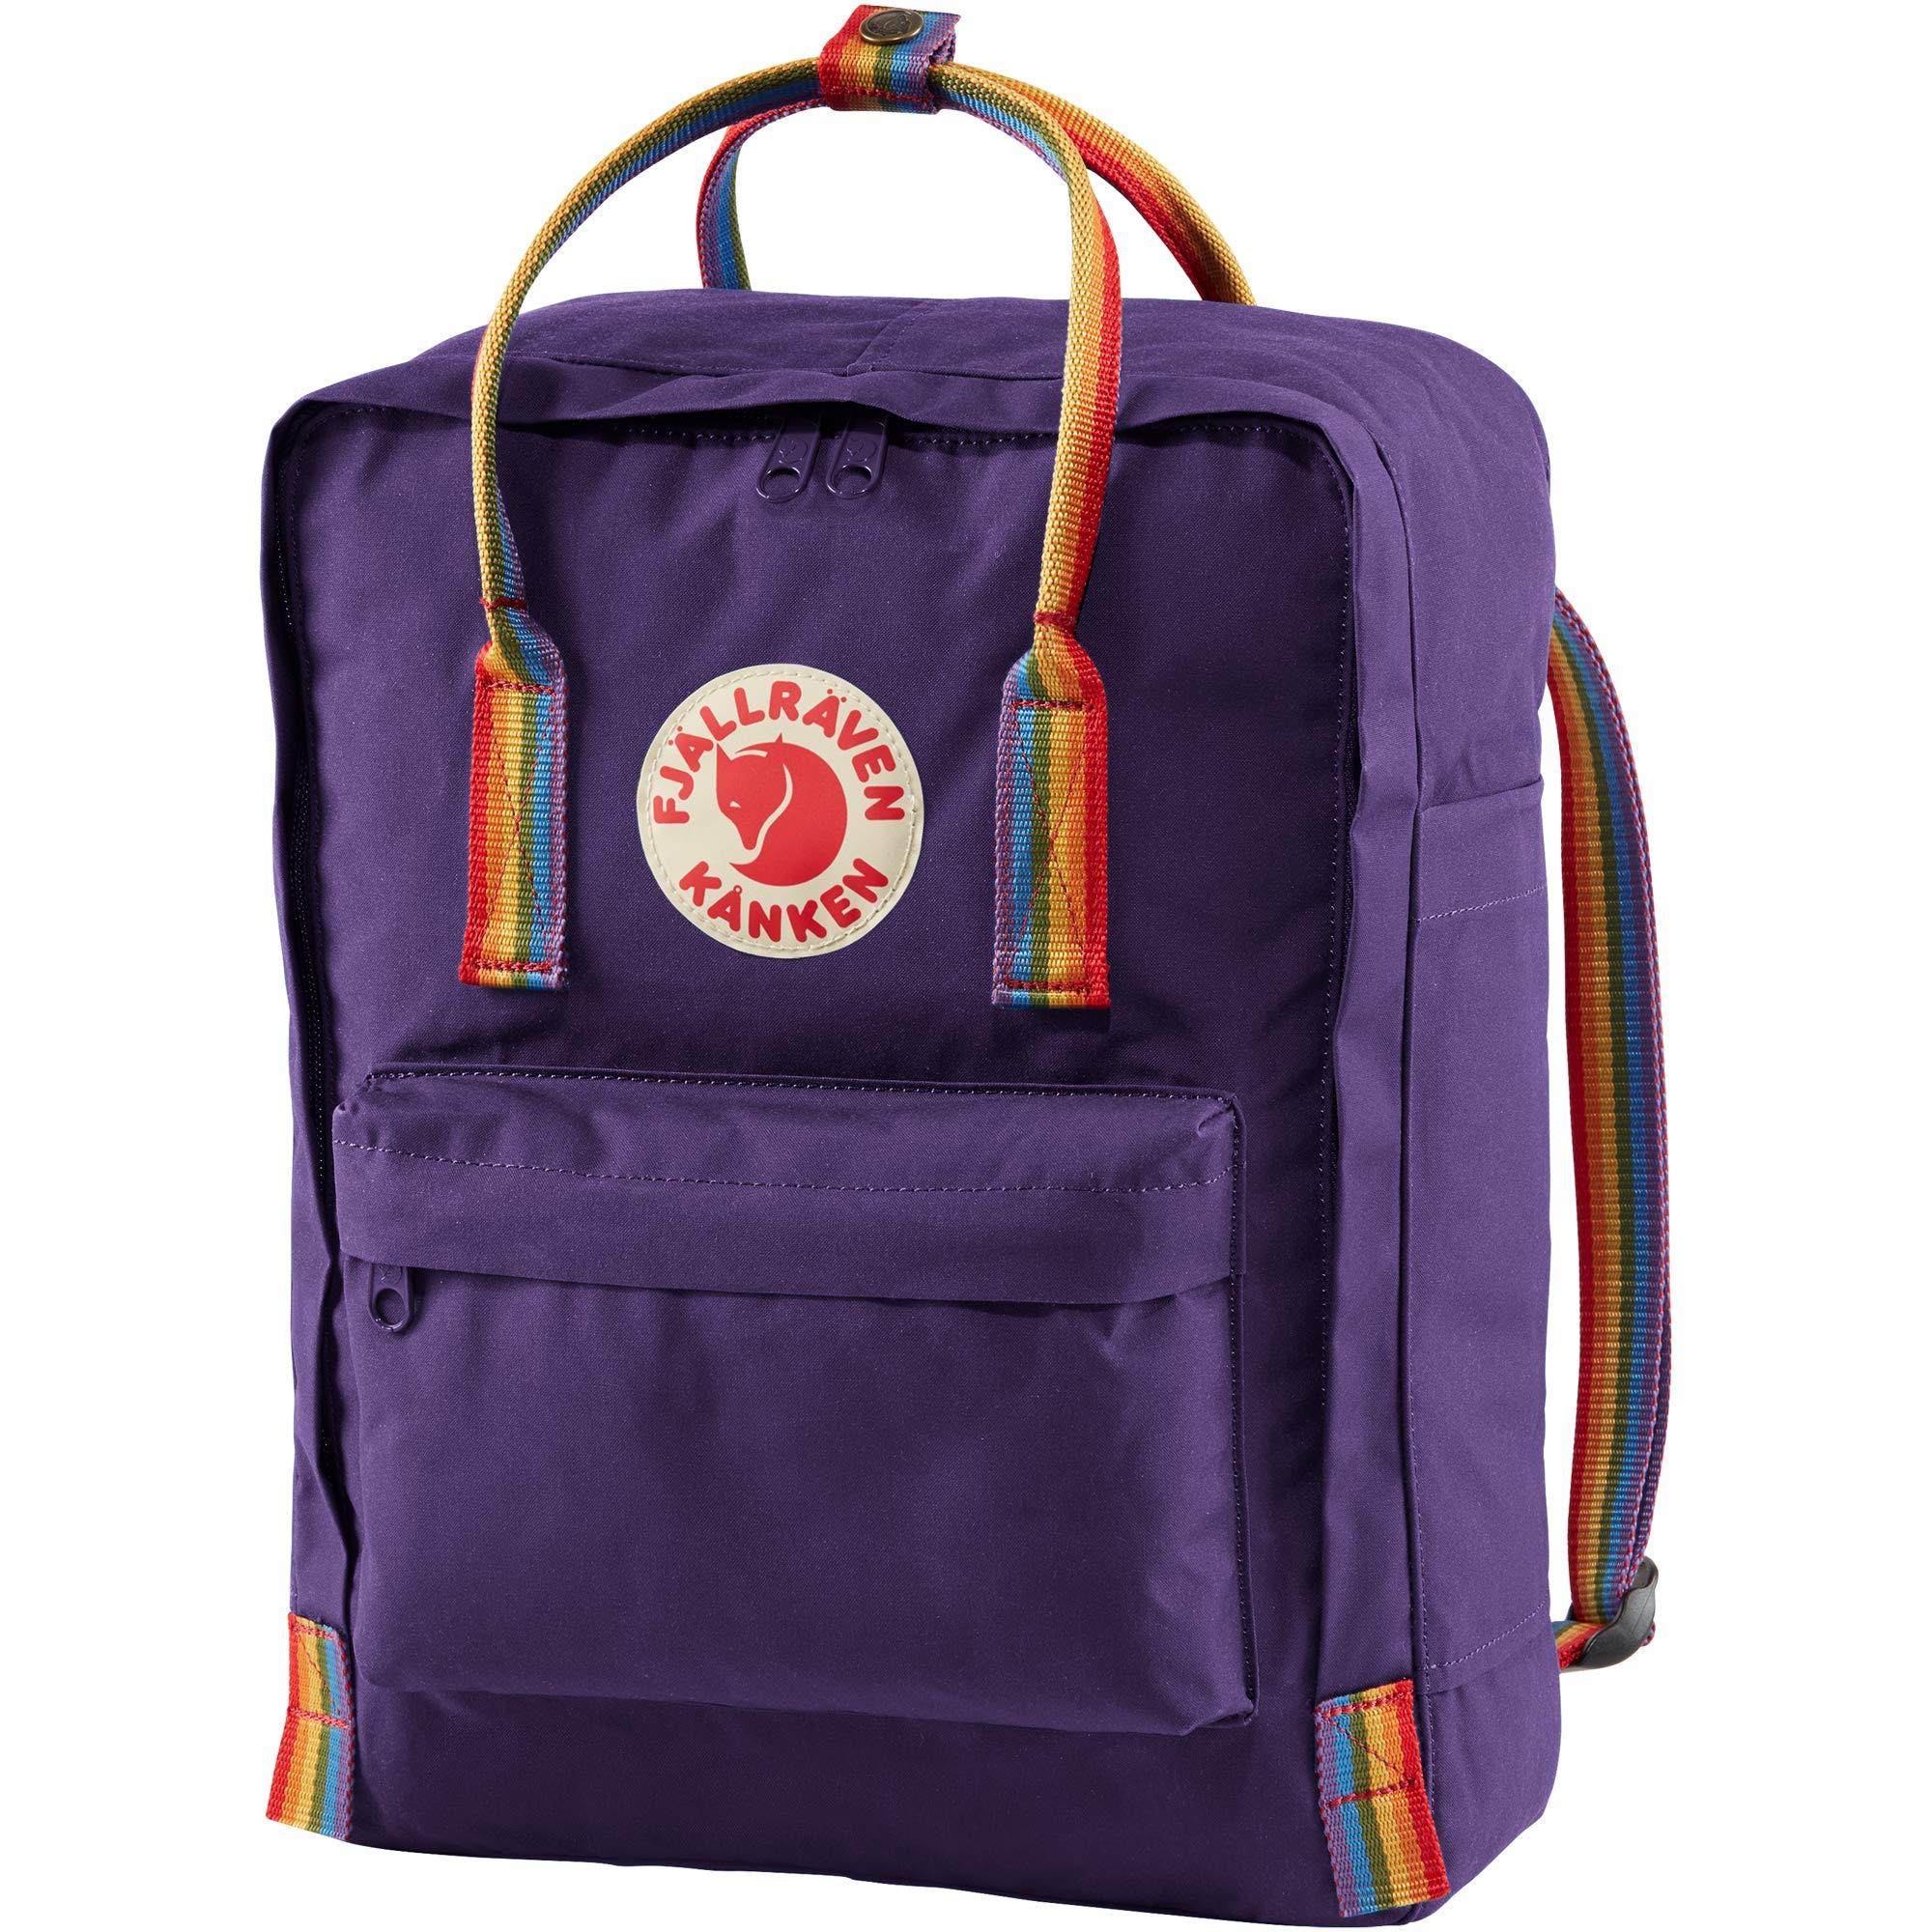 Fjallraven Women's Kanken Backpack, Purple/Rainbow, One Size